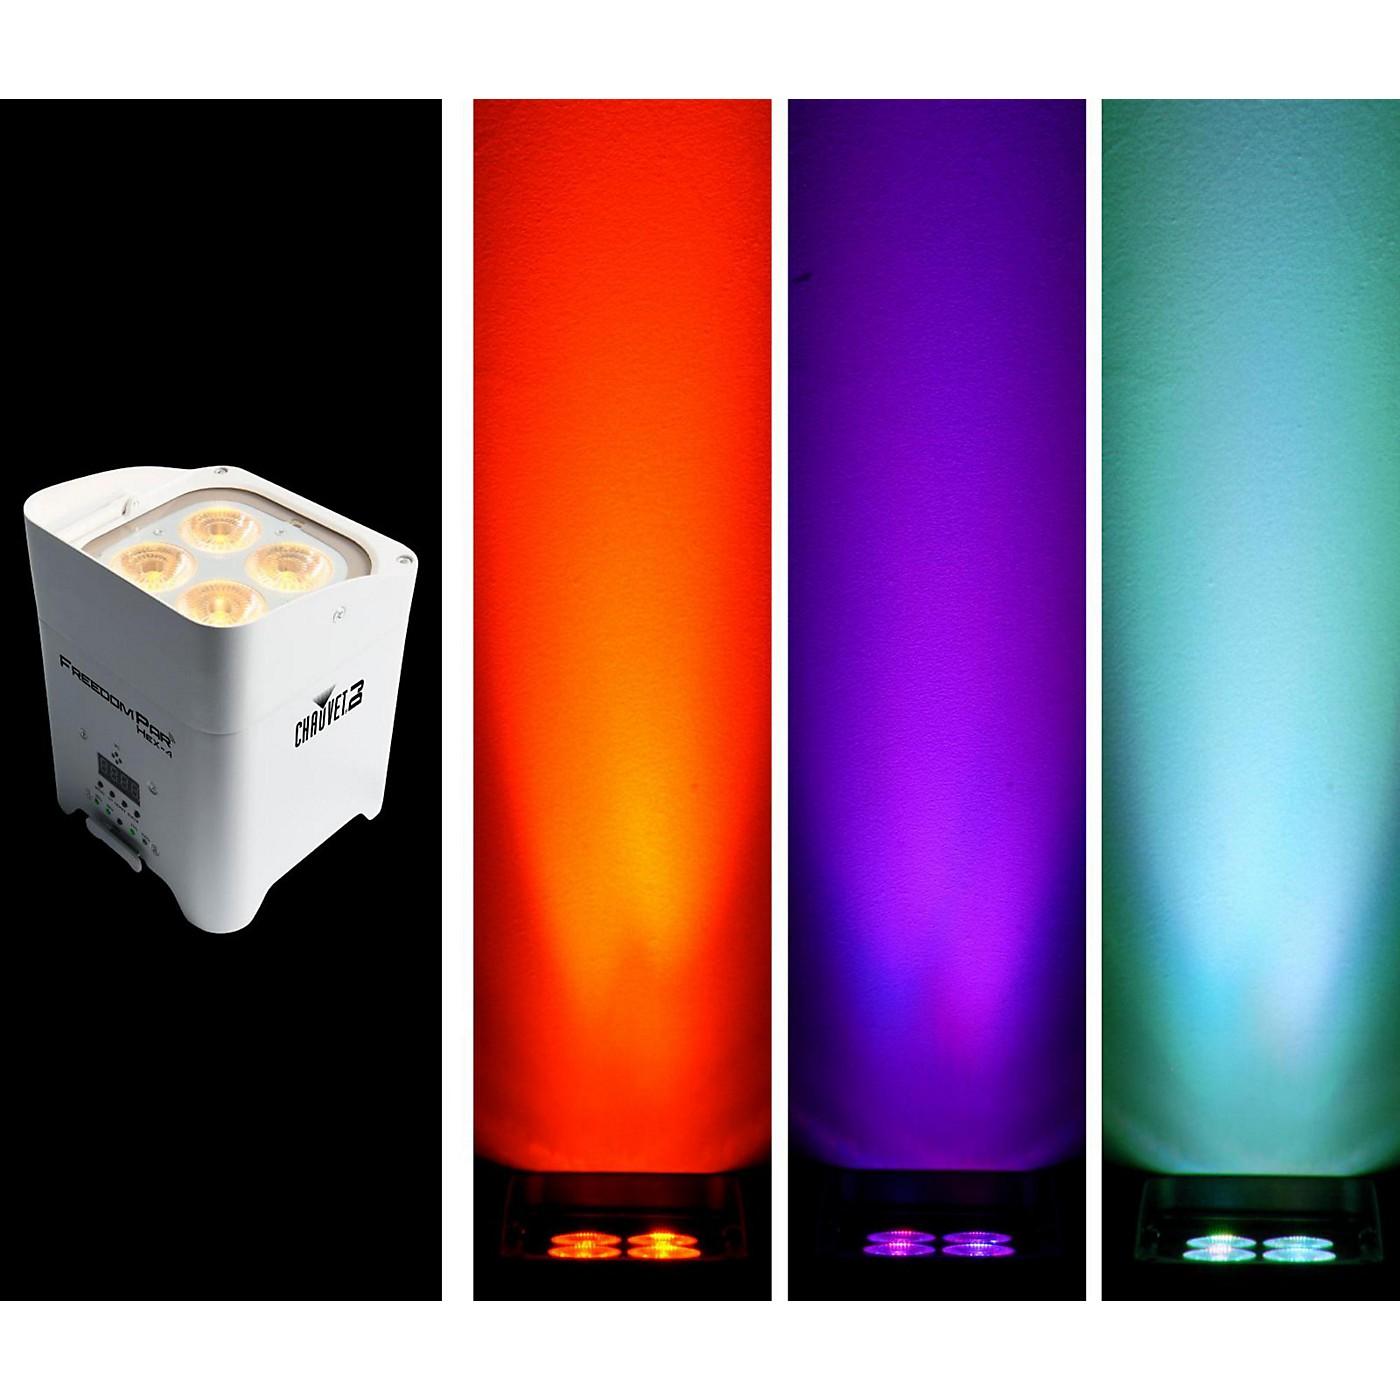 CHAUVET DJ Freedom Par Hex-4 Battery-Powered/Wireless RGBAW+UV LED Par Wash Light - White thumbnail